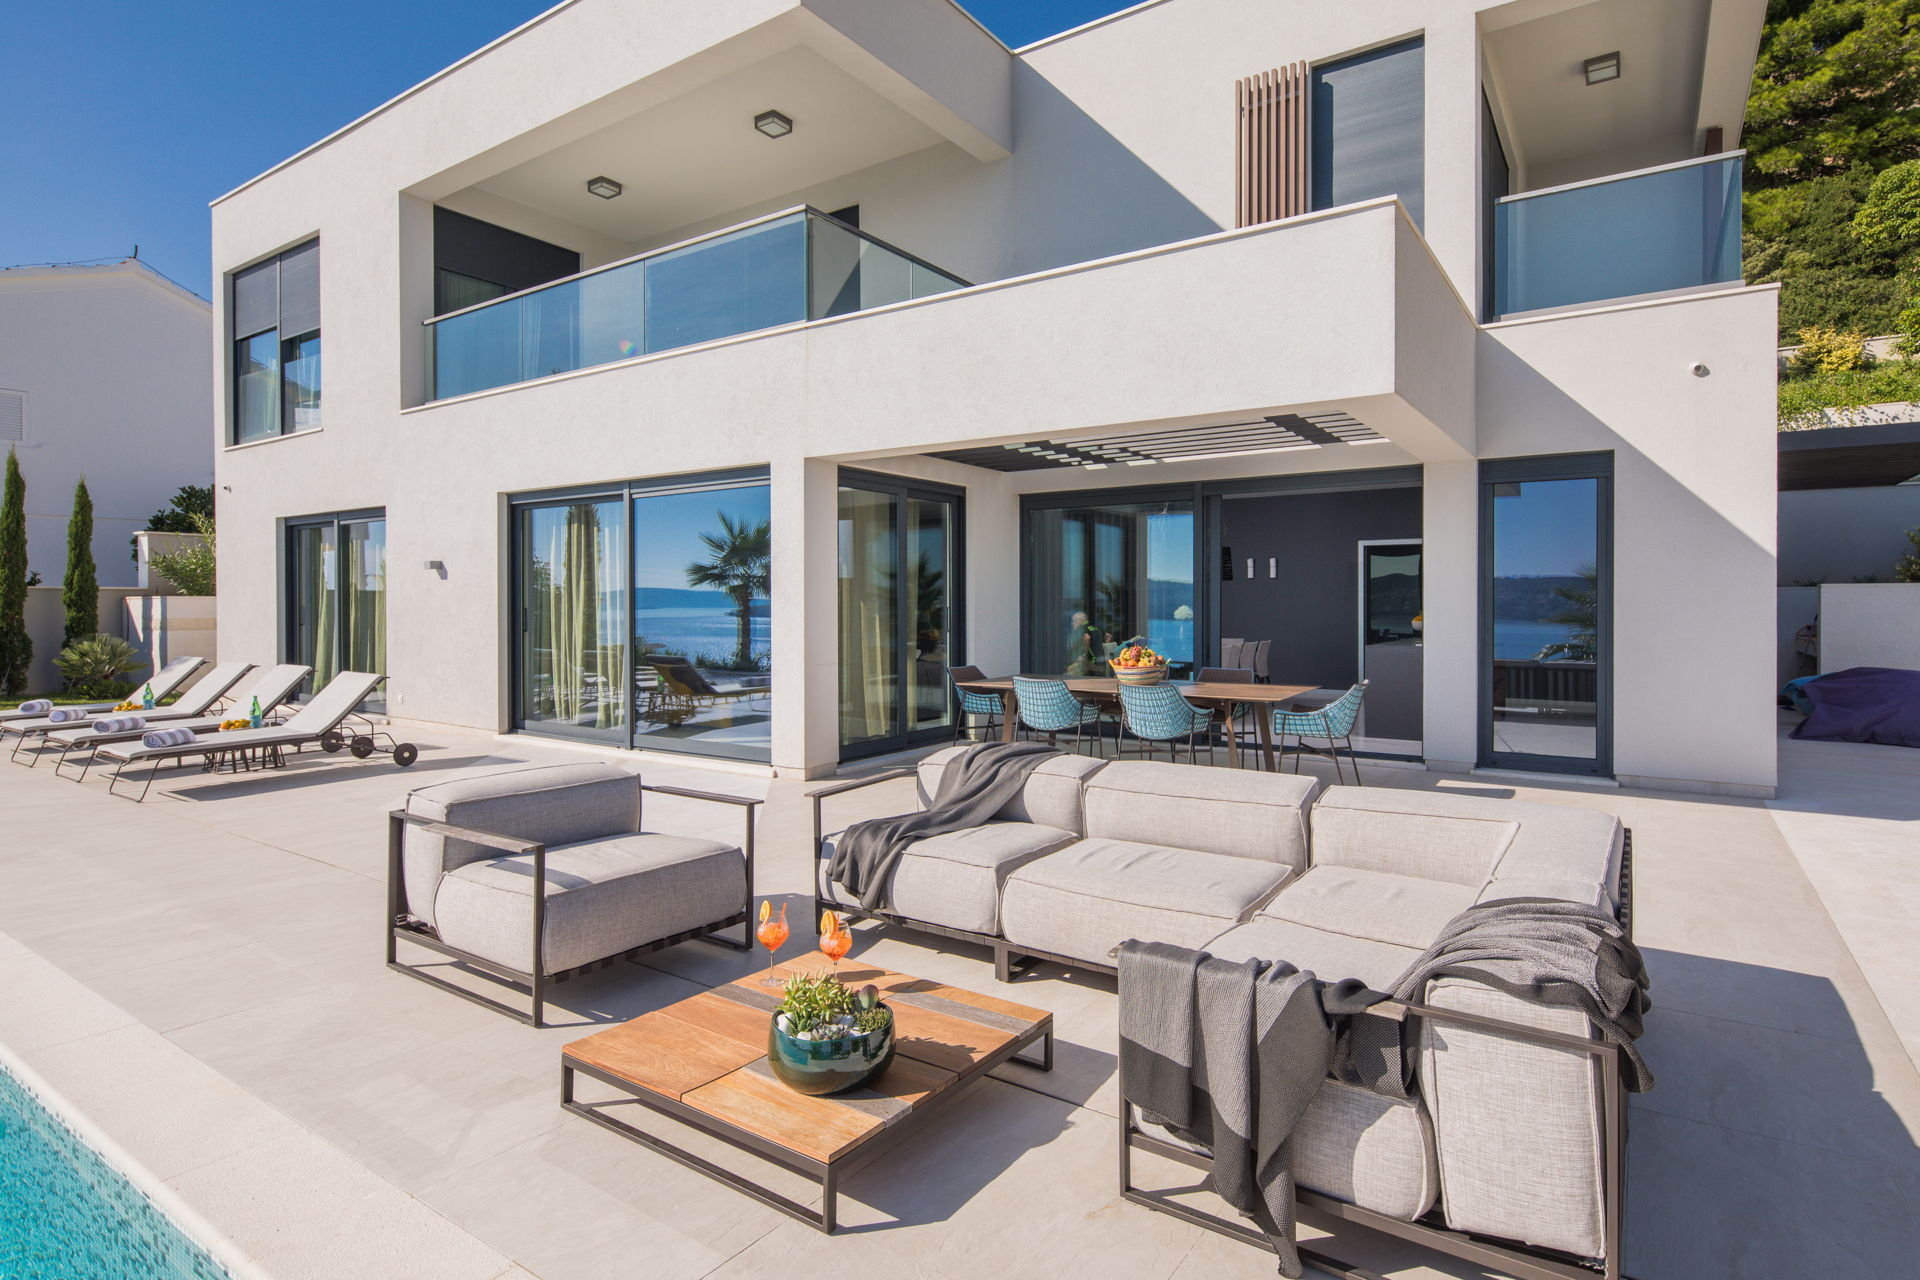 Ultraluxury Villa Elyzeum with heated pool near Trogir Croatia